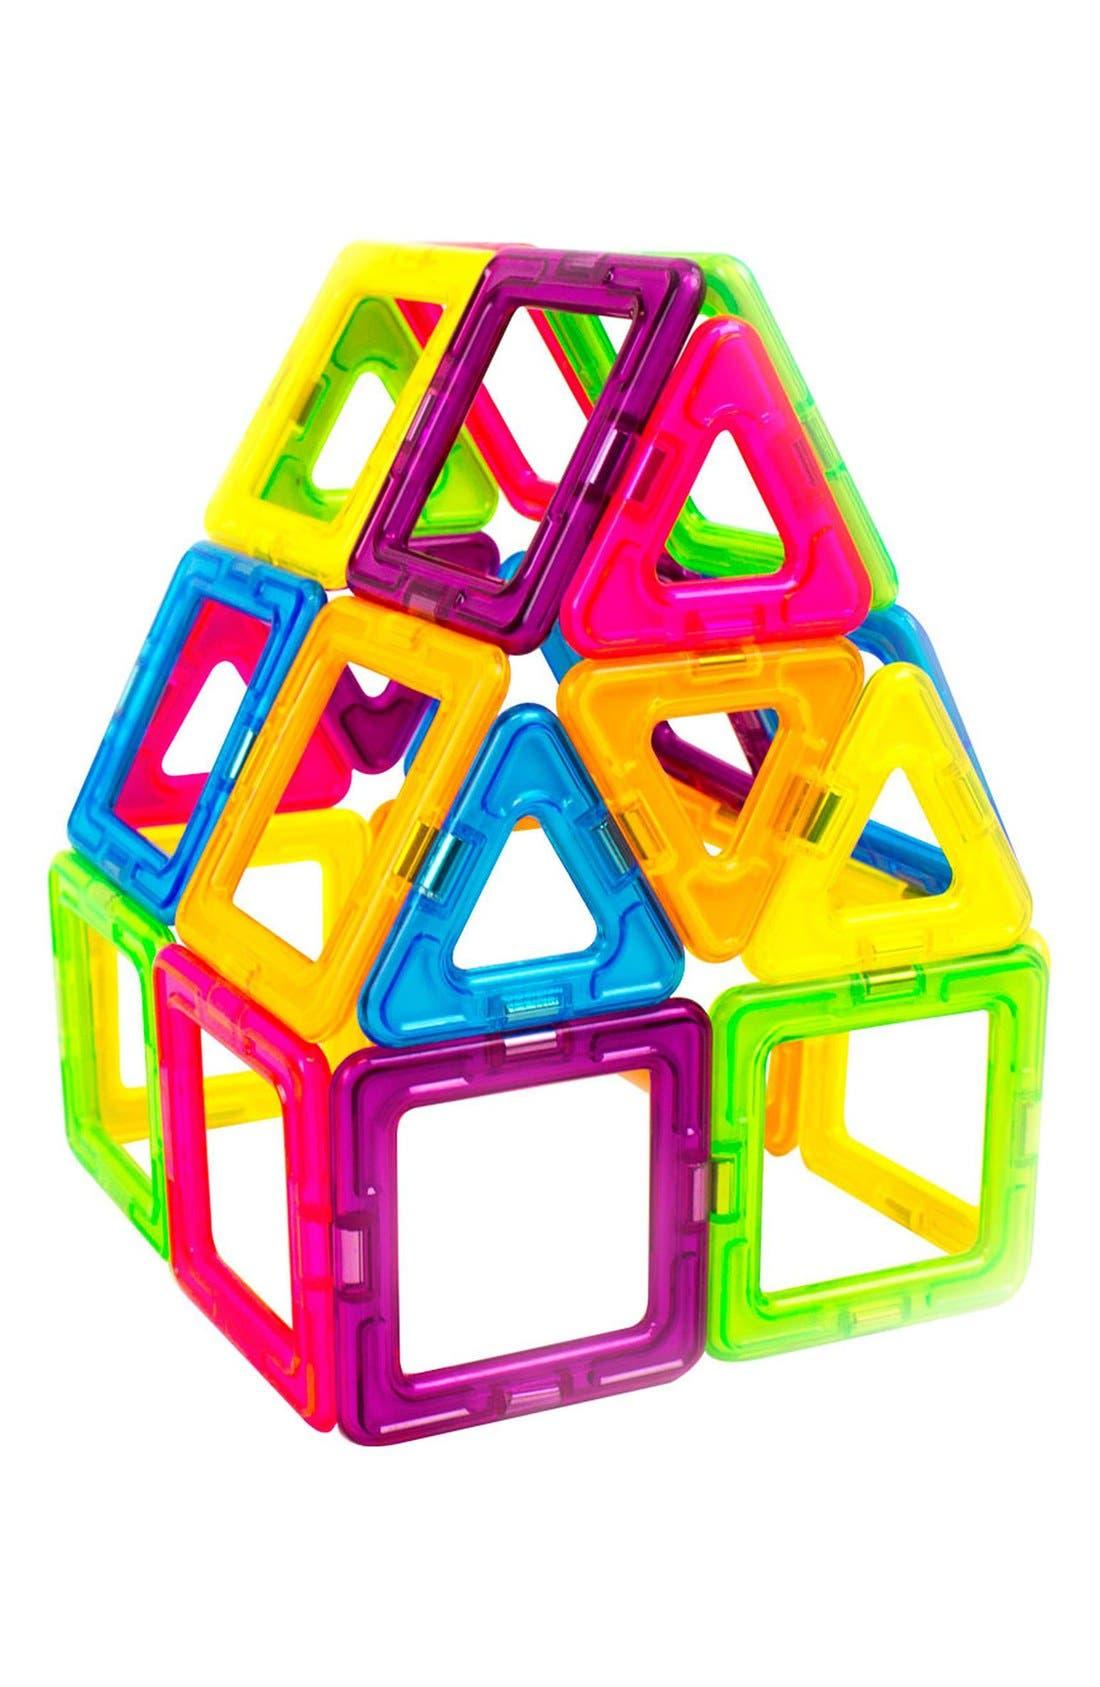 'Creator' Neon Magnetic 3D Construction Set,                             Alternate thumbnail 4, color,                             Neon Rainbow